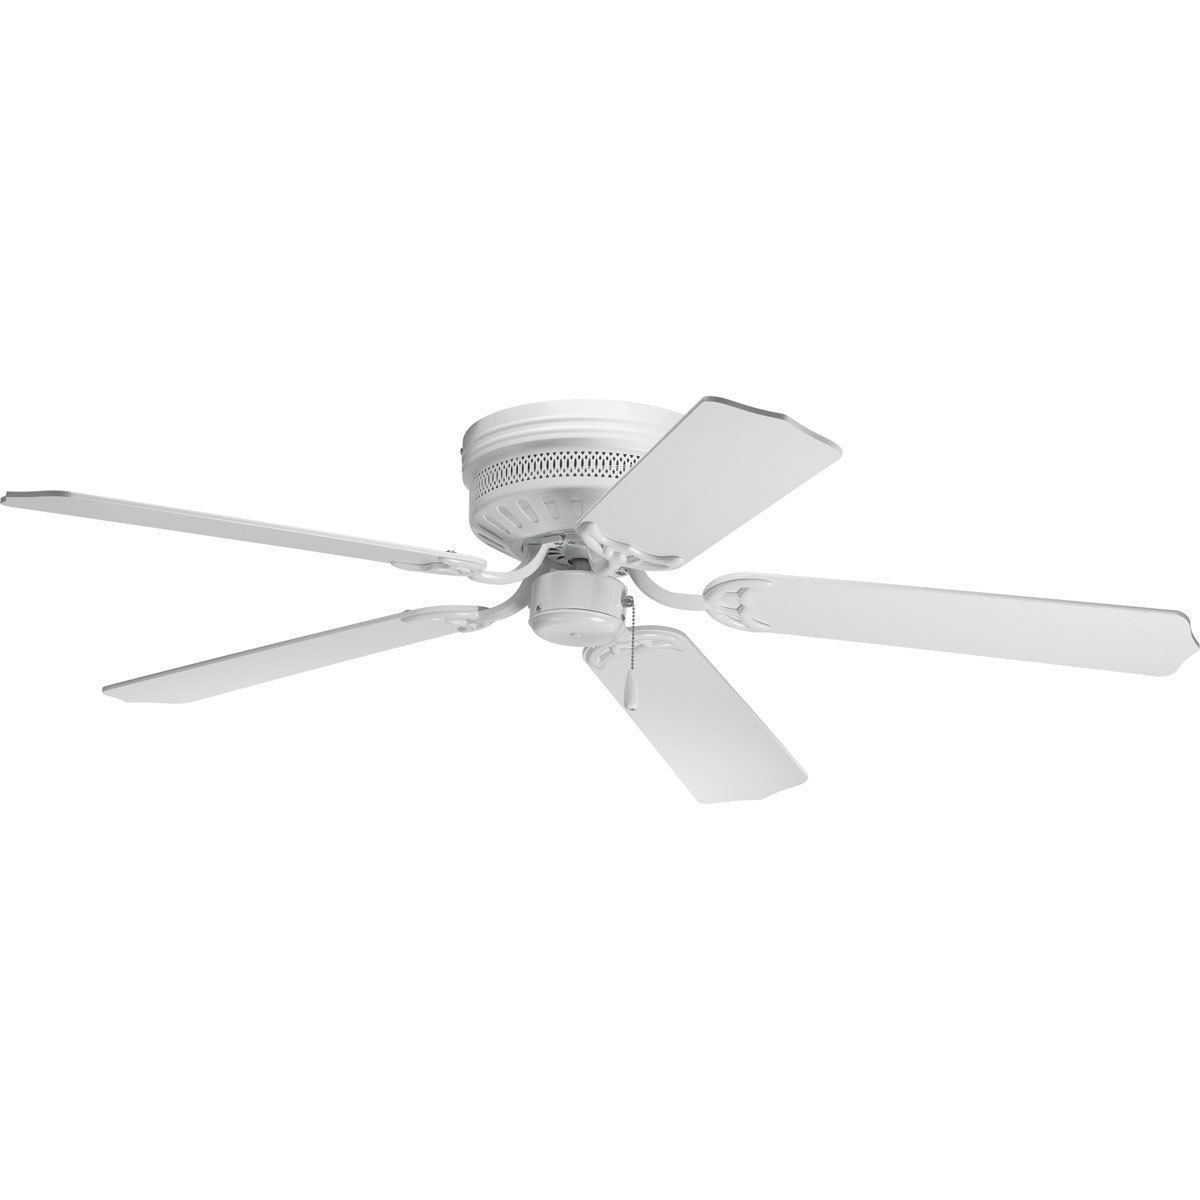 Progress lighting airpro hugger inch blade white ceiling fan